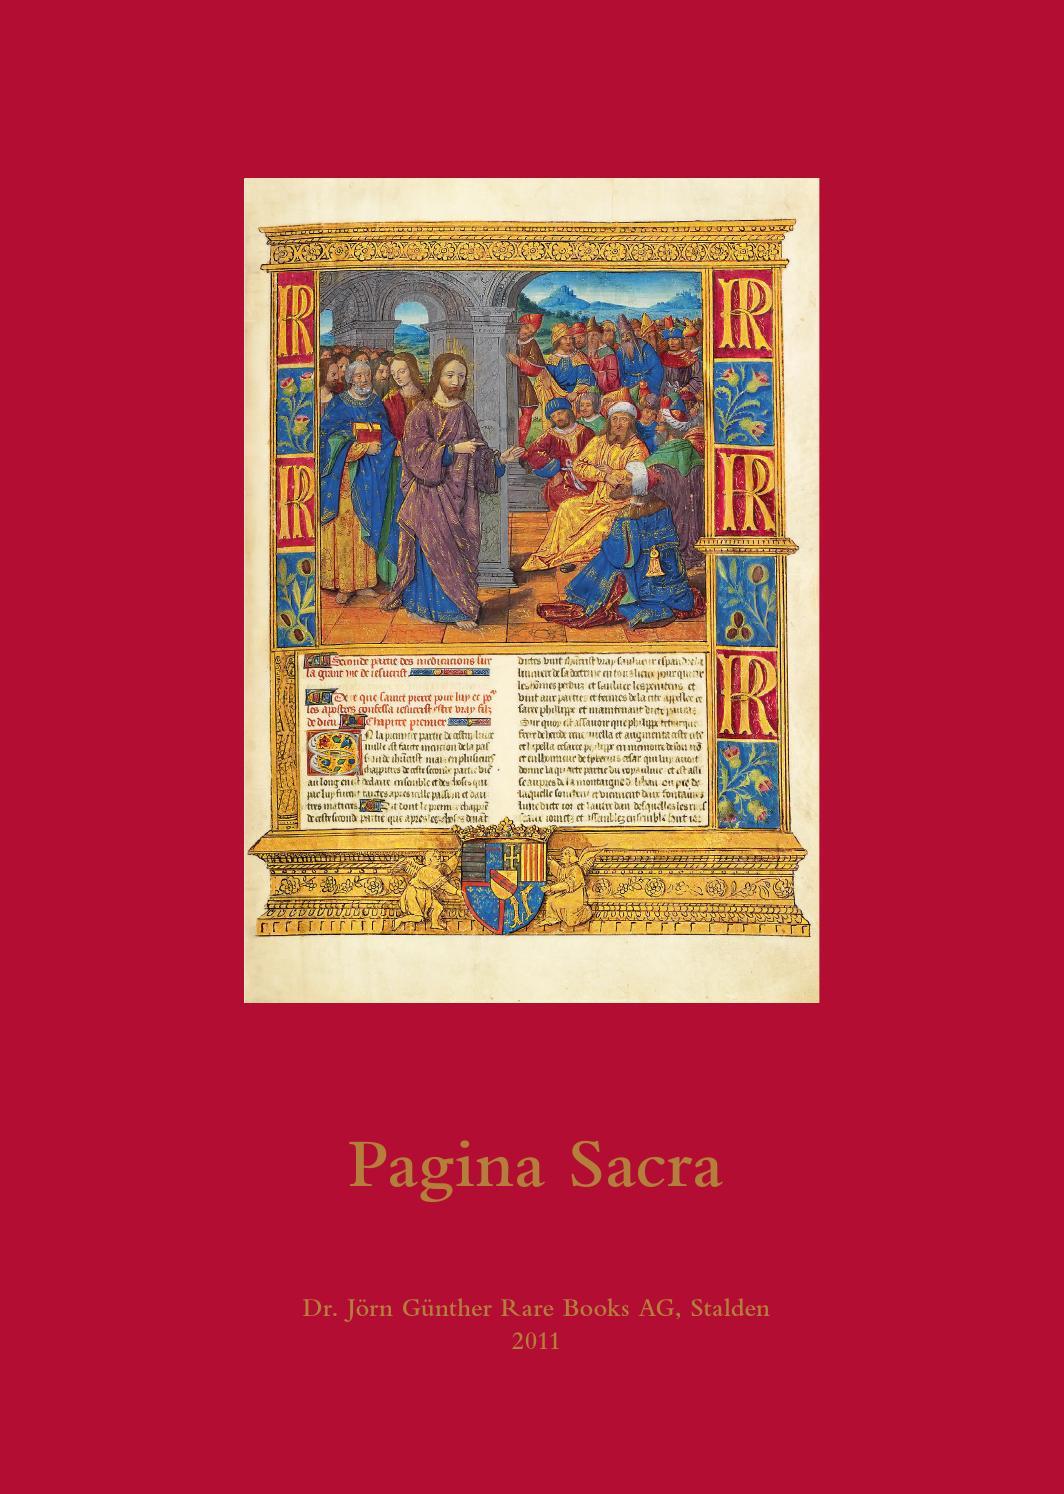 Catalogue 10 Pagina Sacra By Jg Rarebooks Issuu